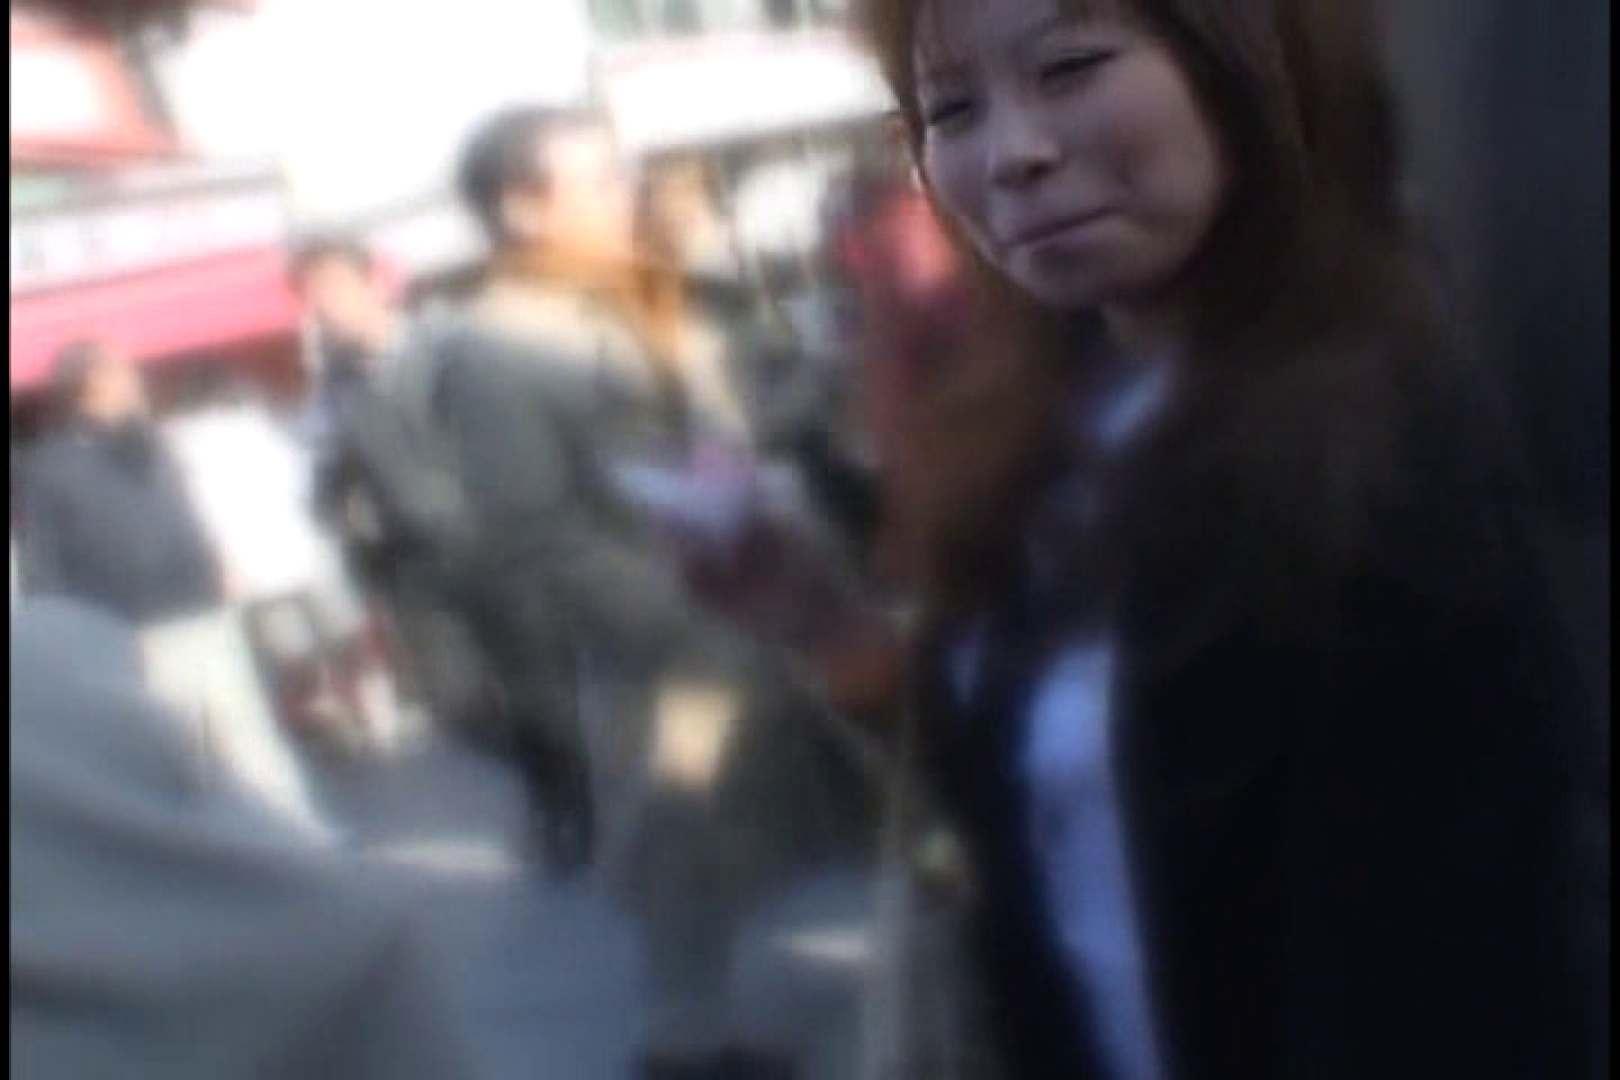 JDハンター全国ツアー vol.014 前編 女子大生のエロ動画 | 0  104PIX 37